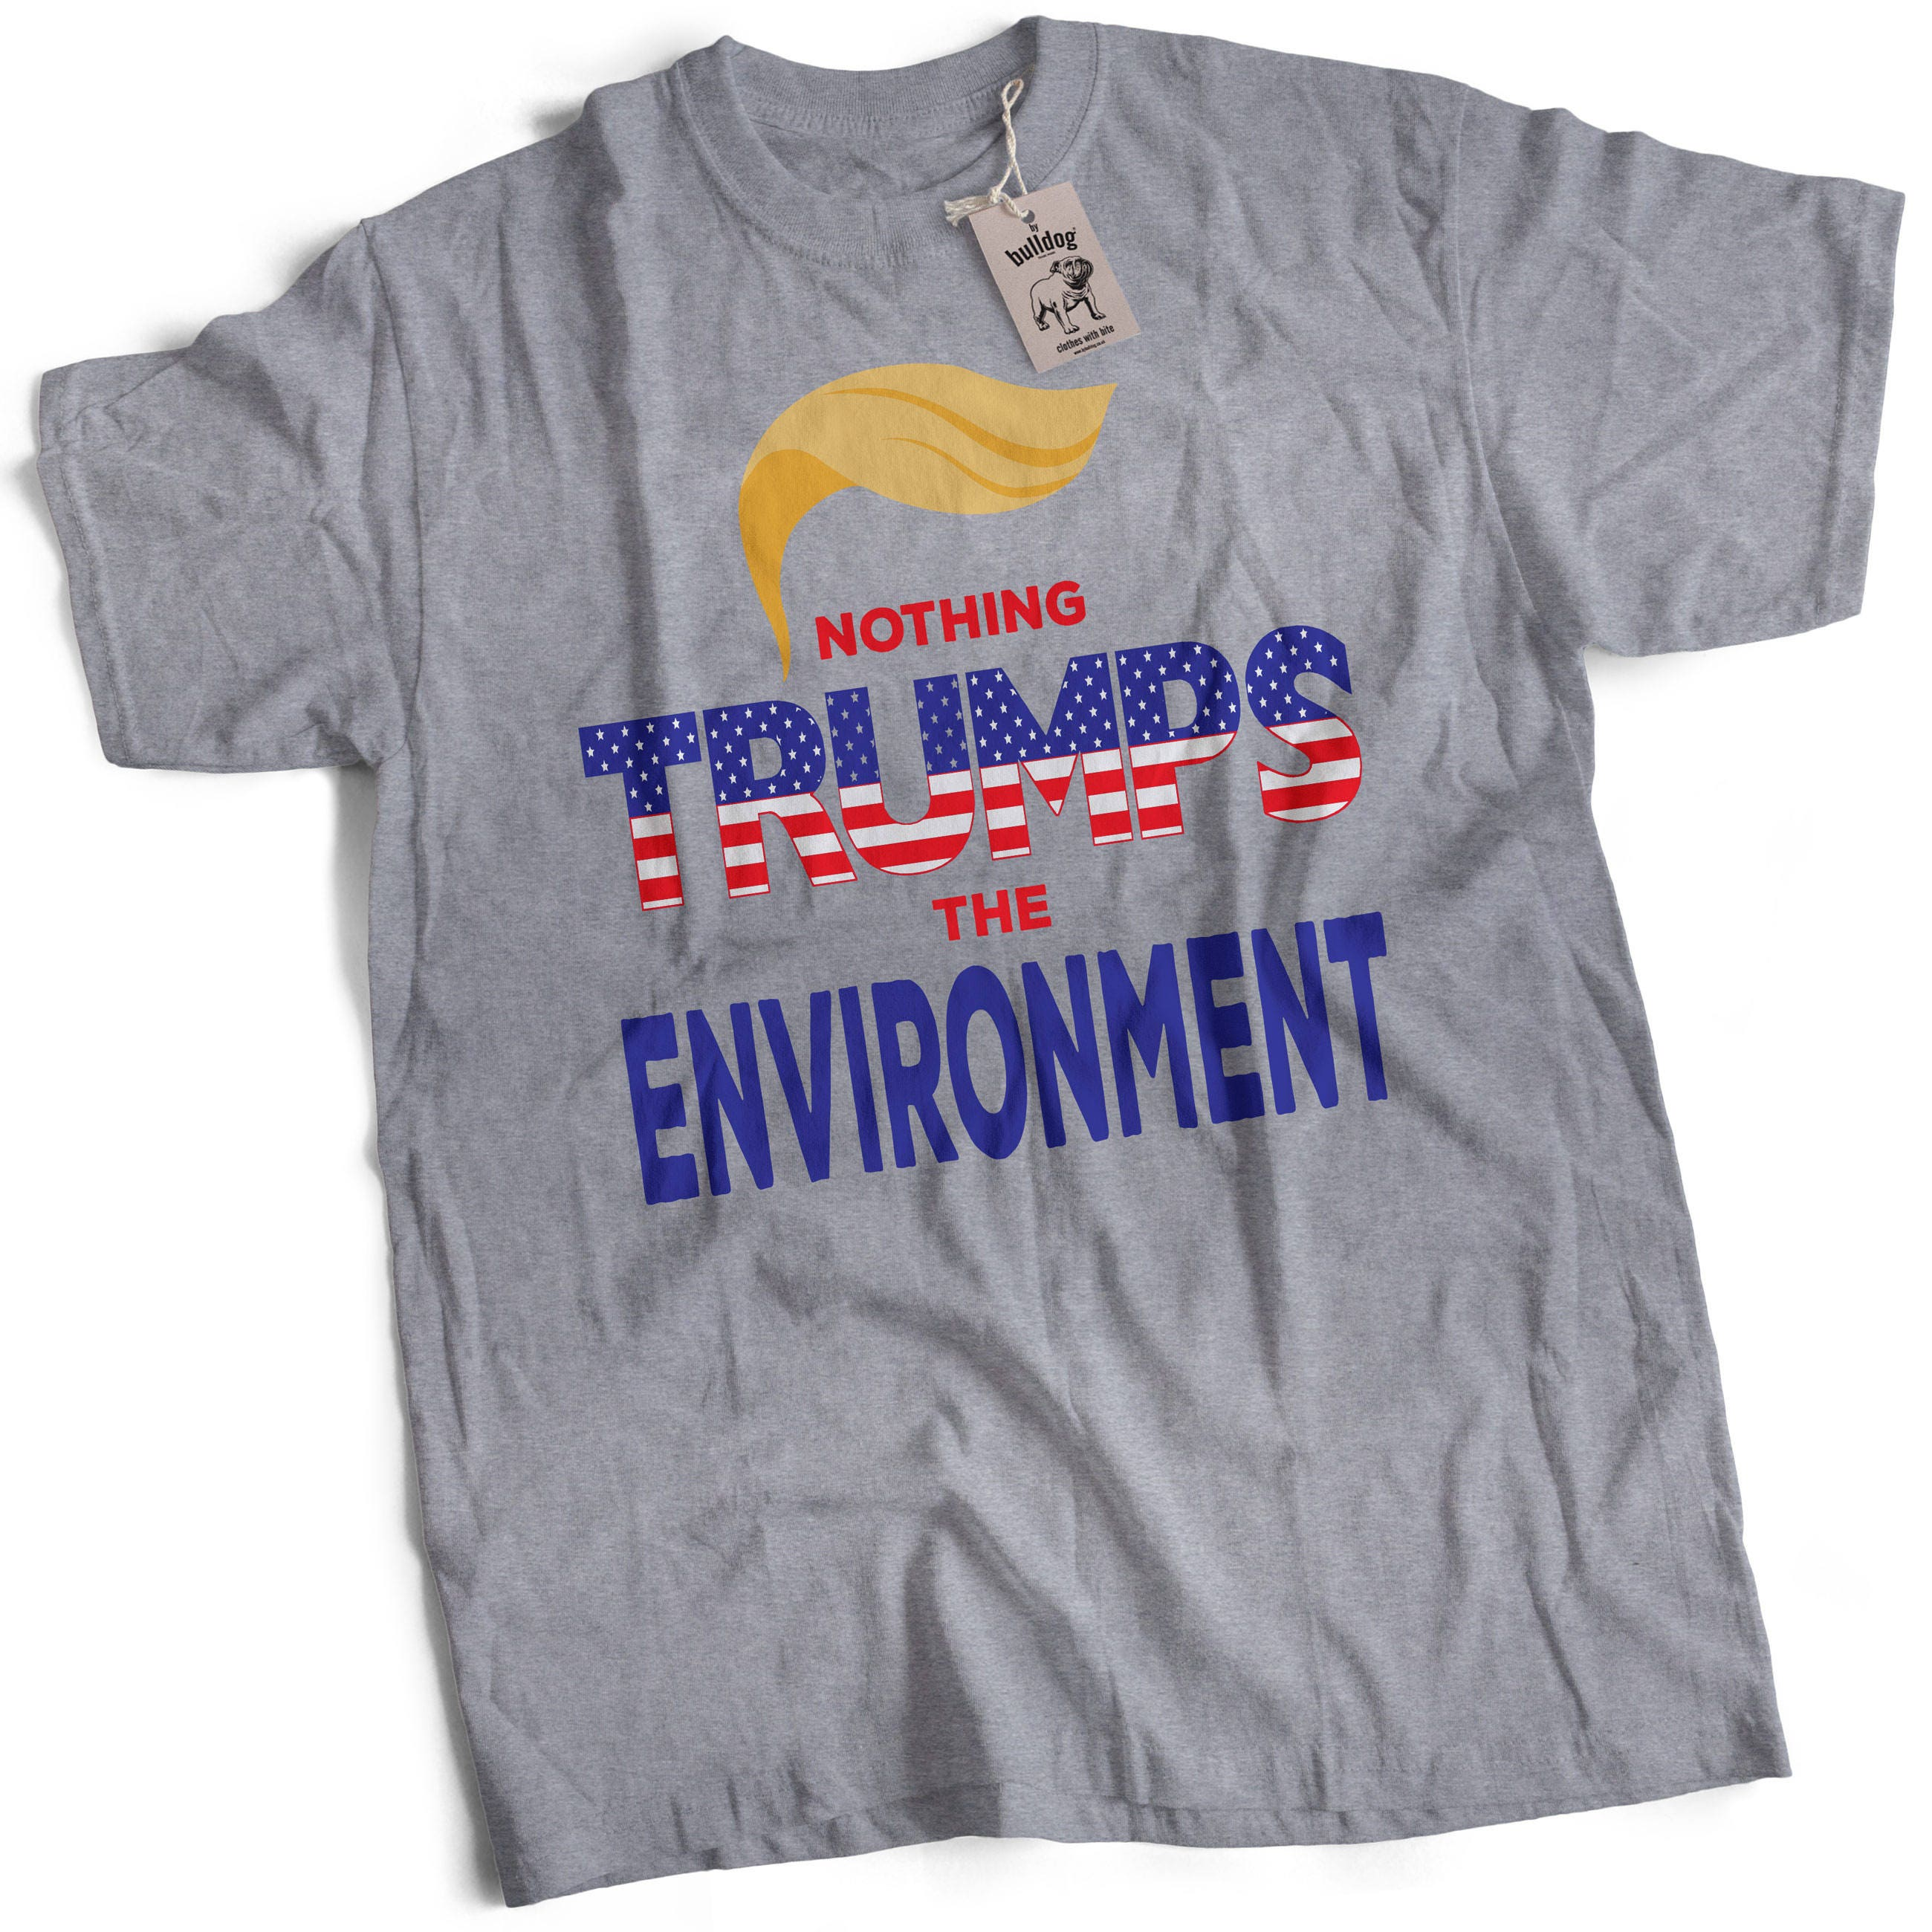 Trump Environment T Shirt Anti Trump T Shirt Paris Agreement Global Warming Climate Change Not My President Political T Shirt